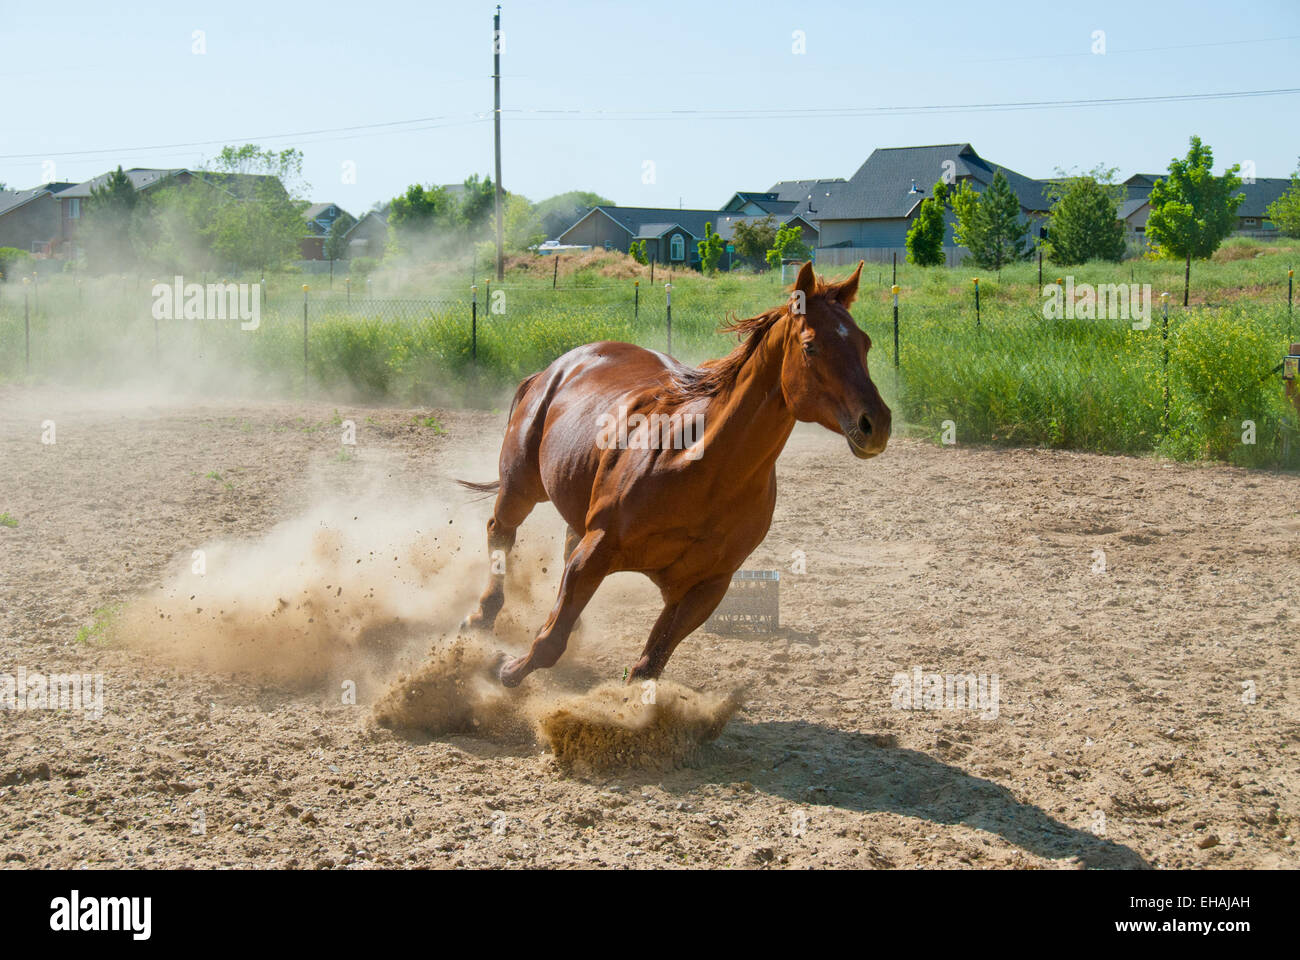 American quarter horse running - Stock Image